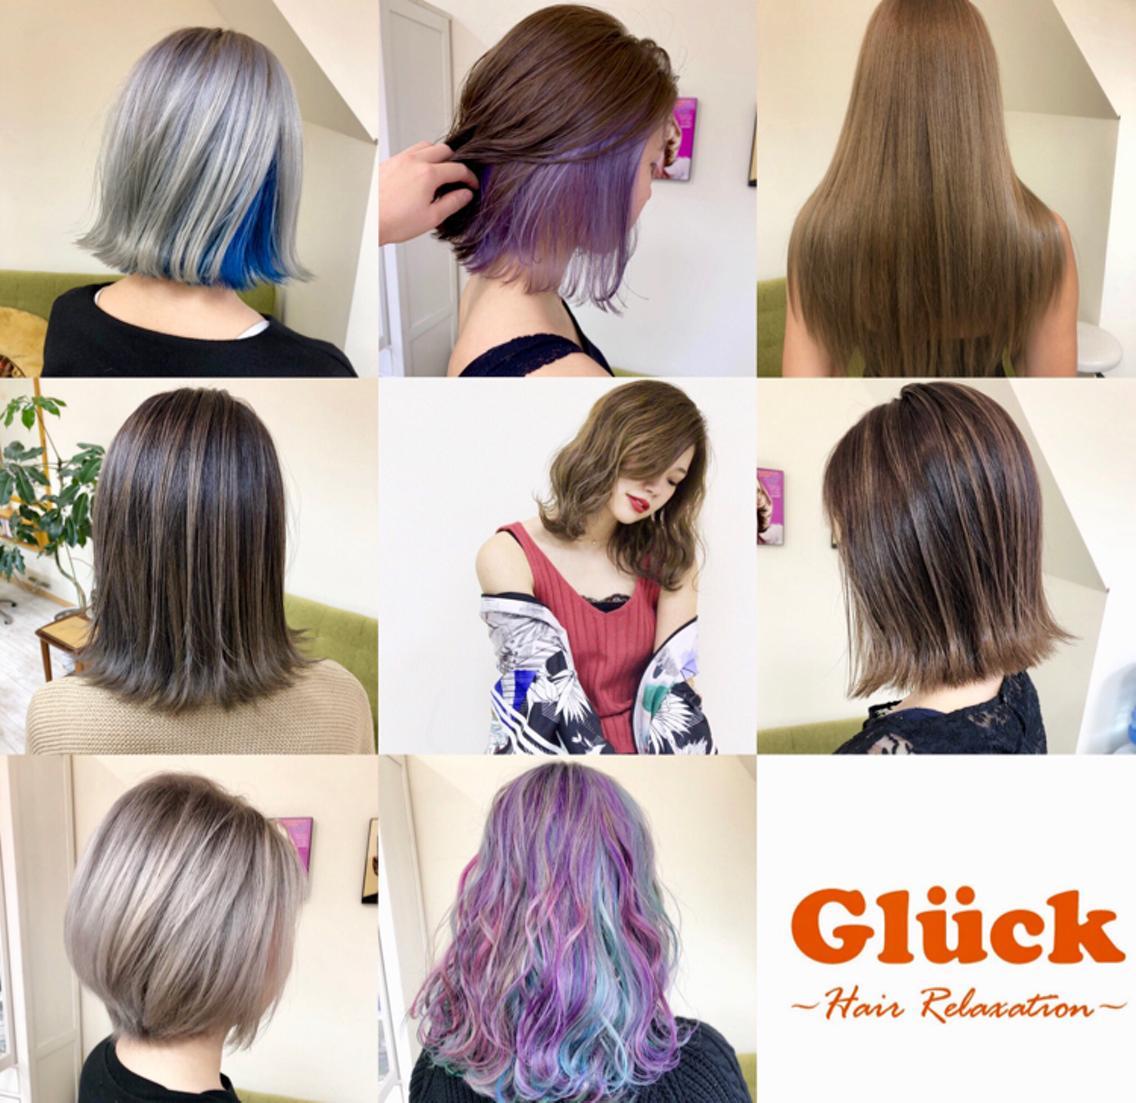 Glück〜hair  relaxation〜所属・directoruechiの掲載